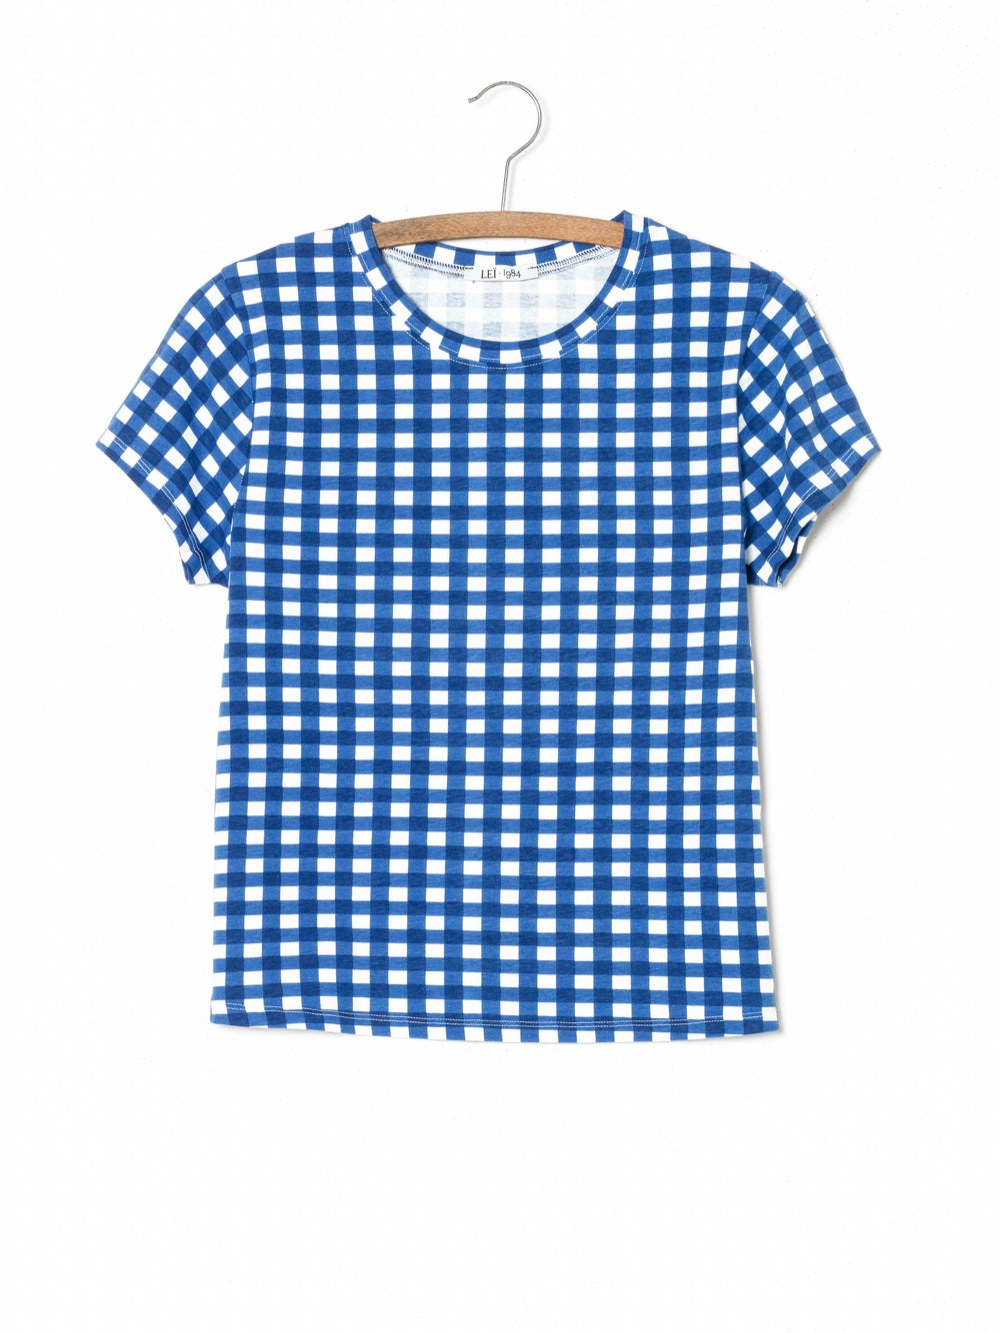 Image of Tee-shirt PRUNE imprimé vichy 55€ -50%